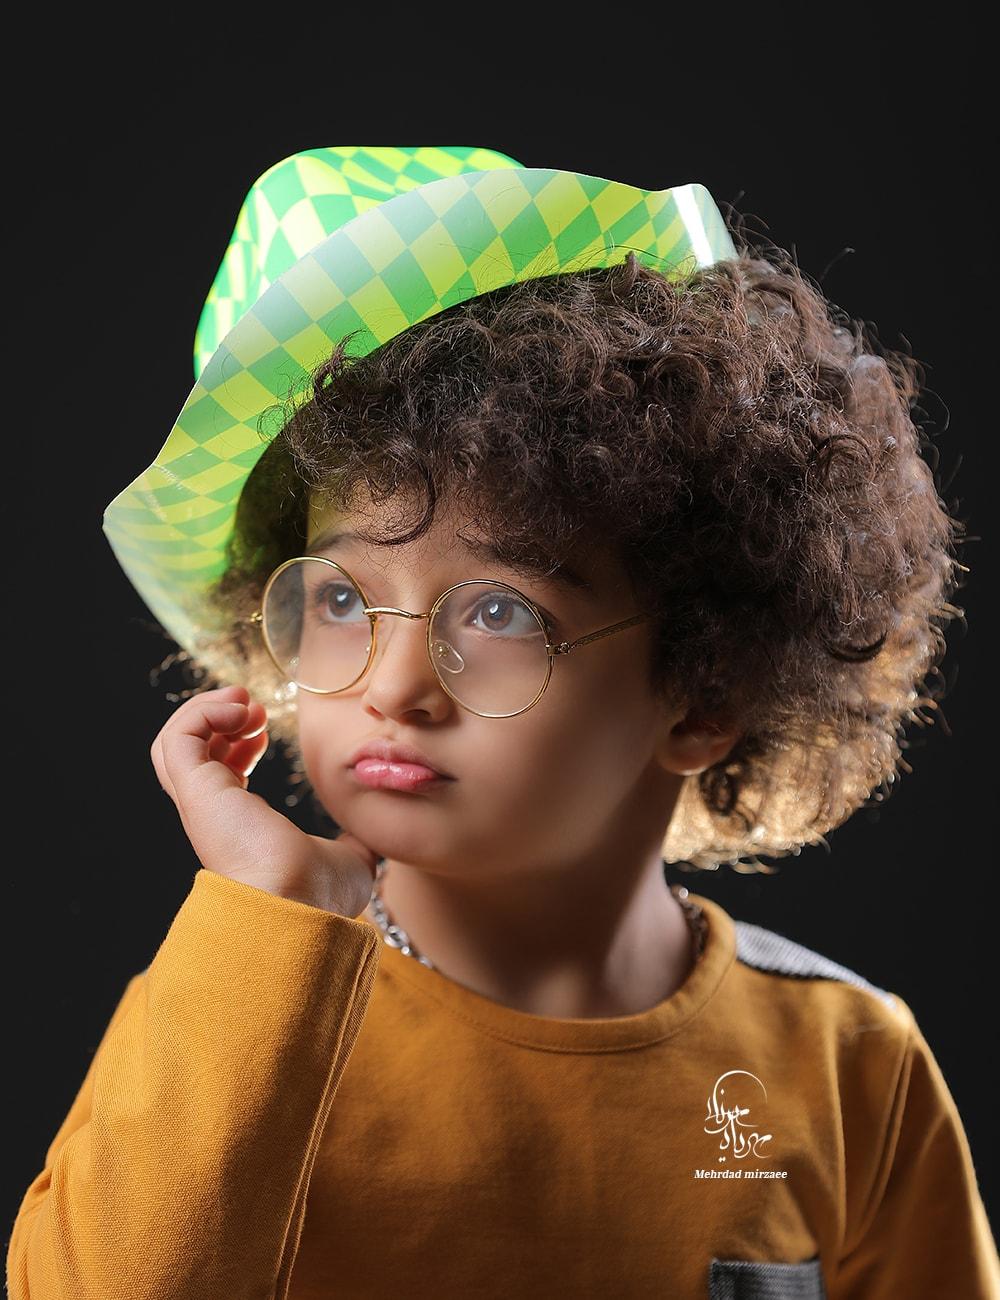 عکس پرتر کودک / آتلیه کودک در کرج / مهرداد میرزایی/بهترین آتلیه کودک در کرج/